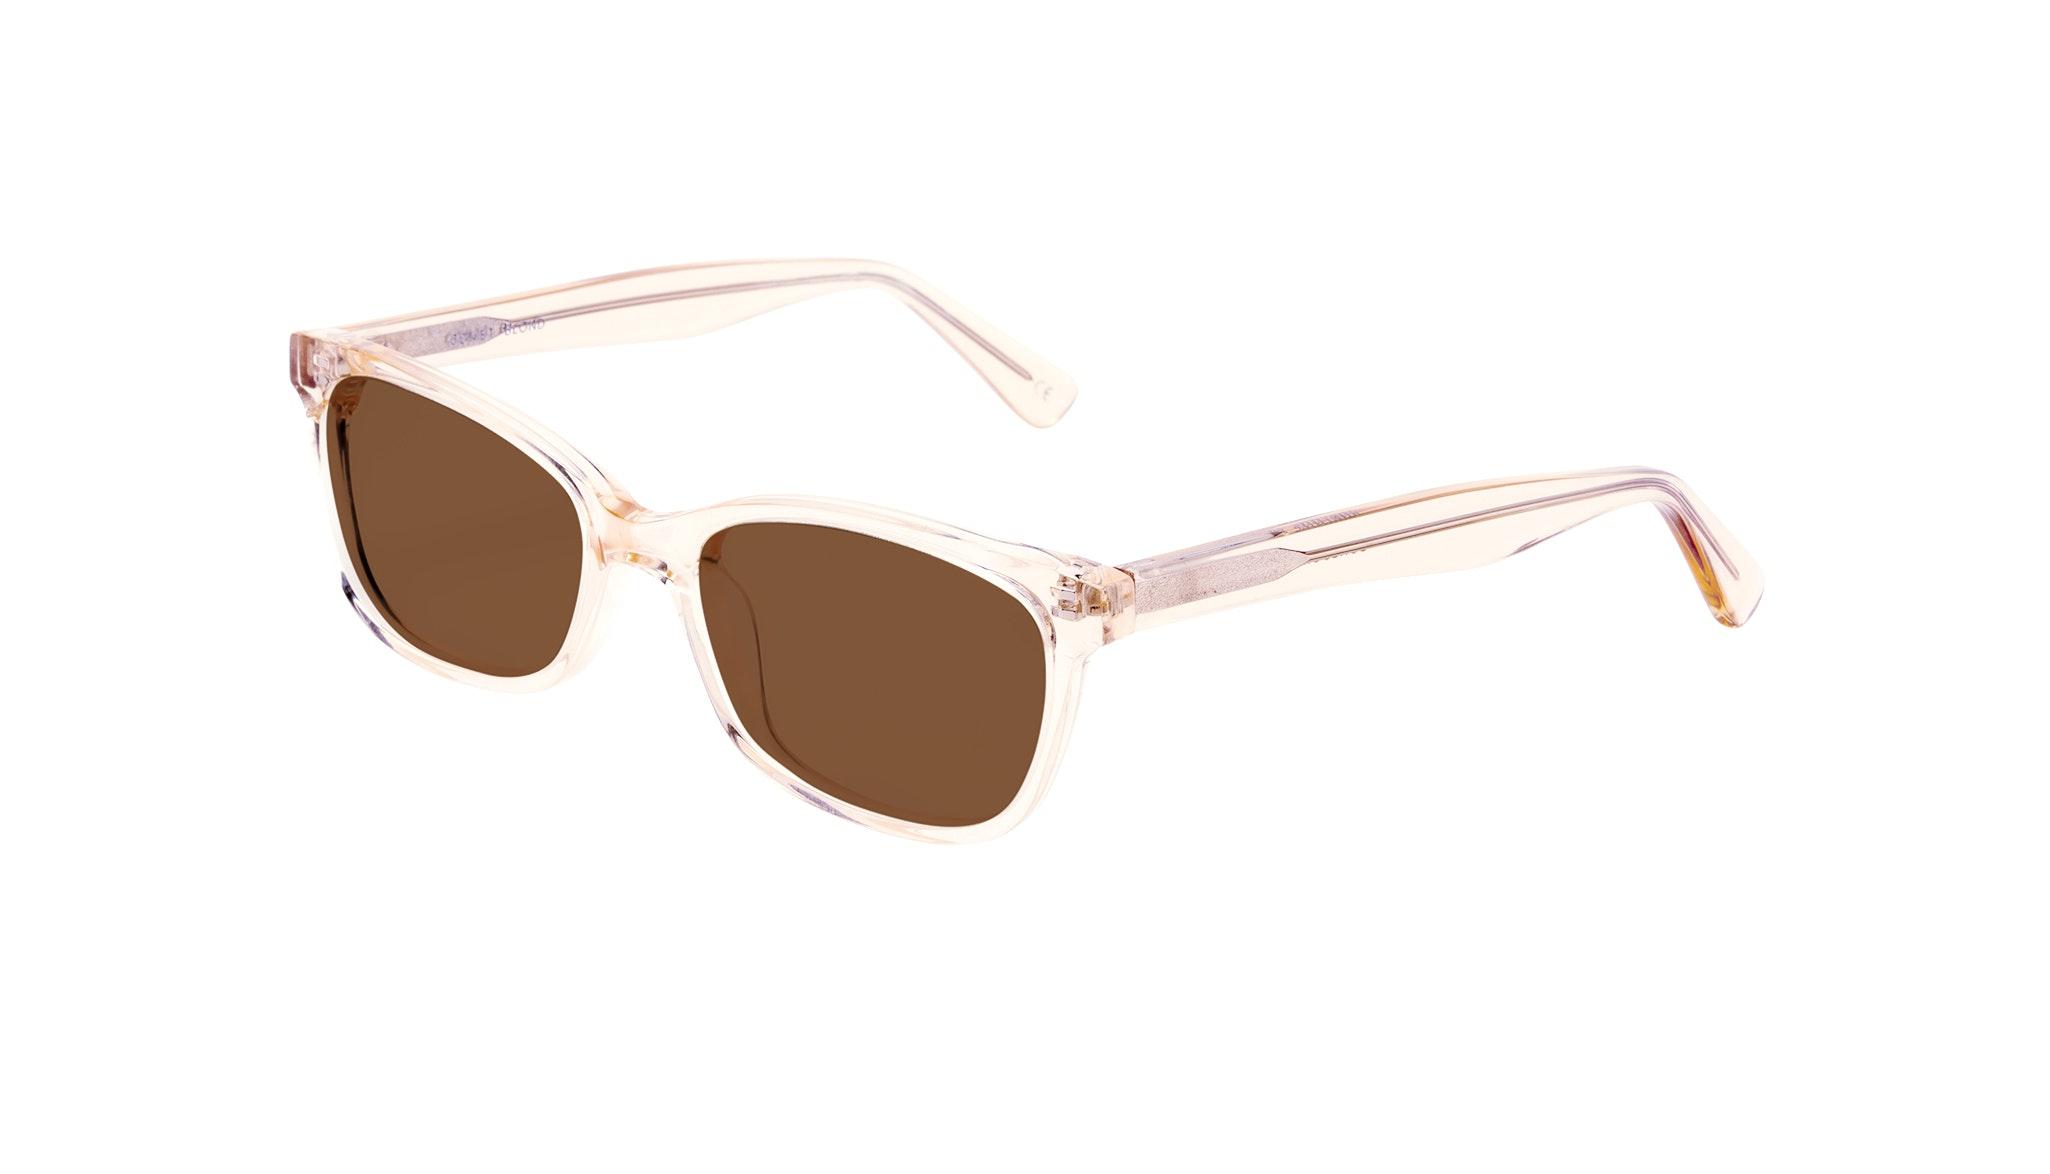 Affordable Fashion Glasses Cat Eye Rectangle Square Sunglasses Women Comet Blond Tilt